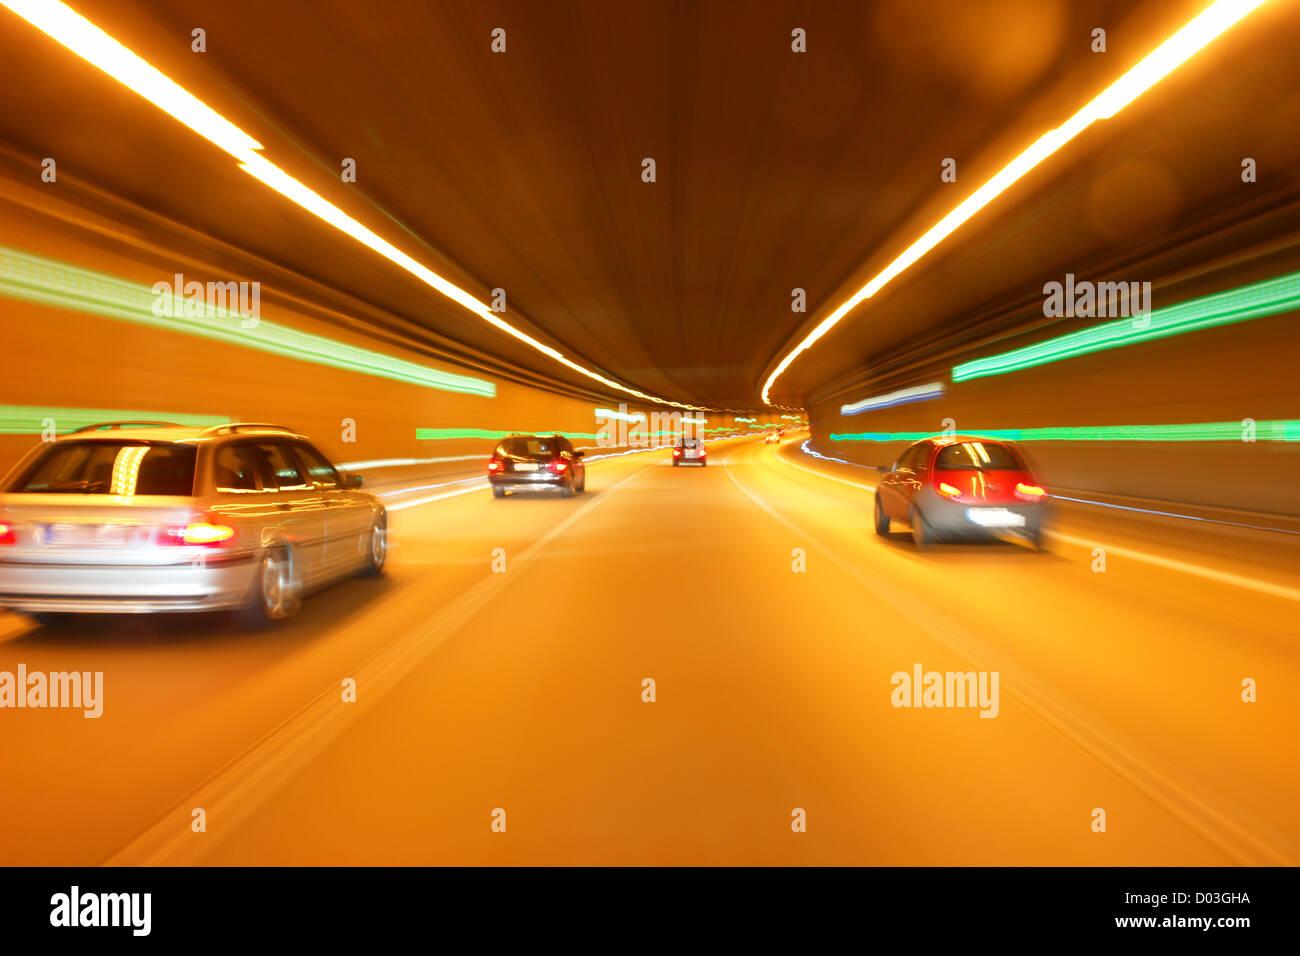 tunnel car motion blur night traffic fast - Stock Image